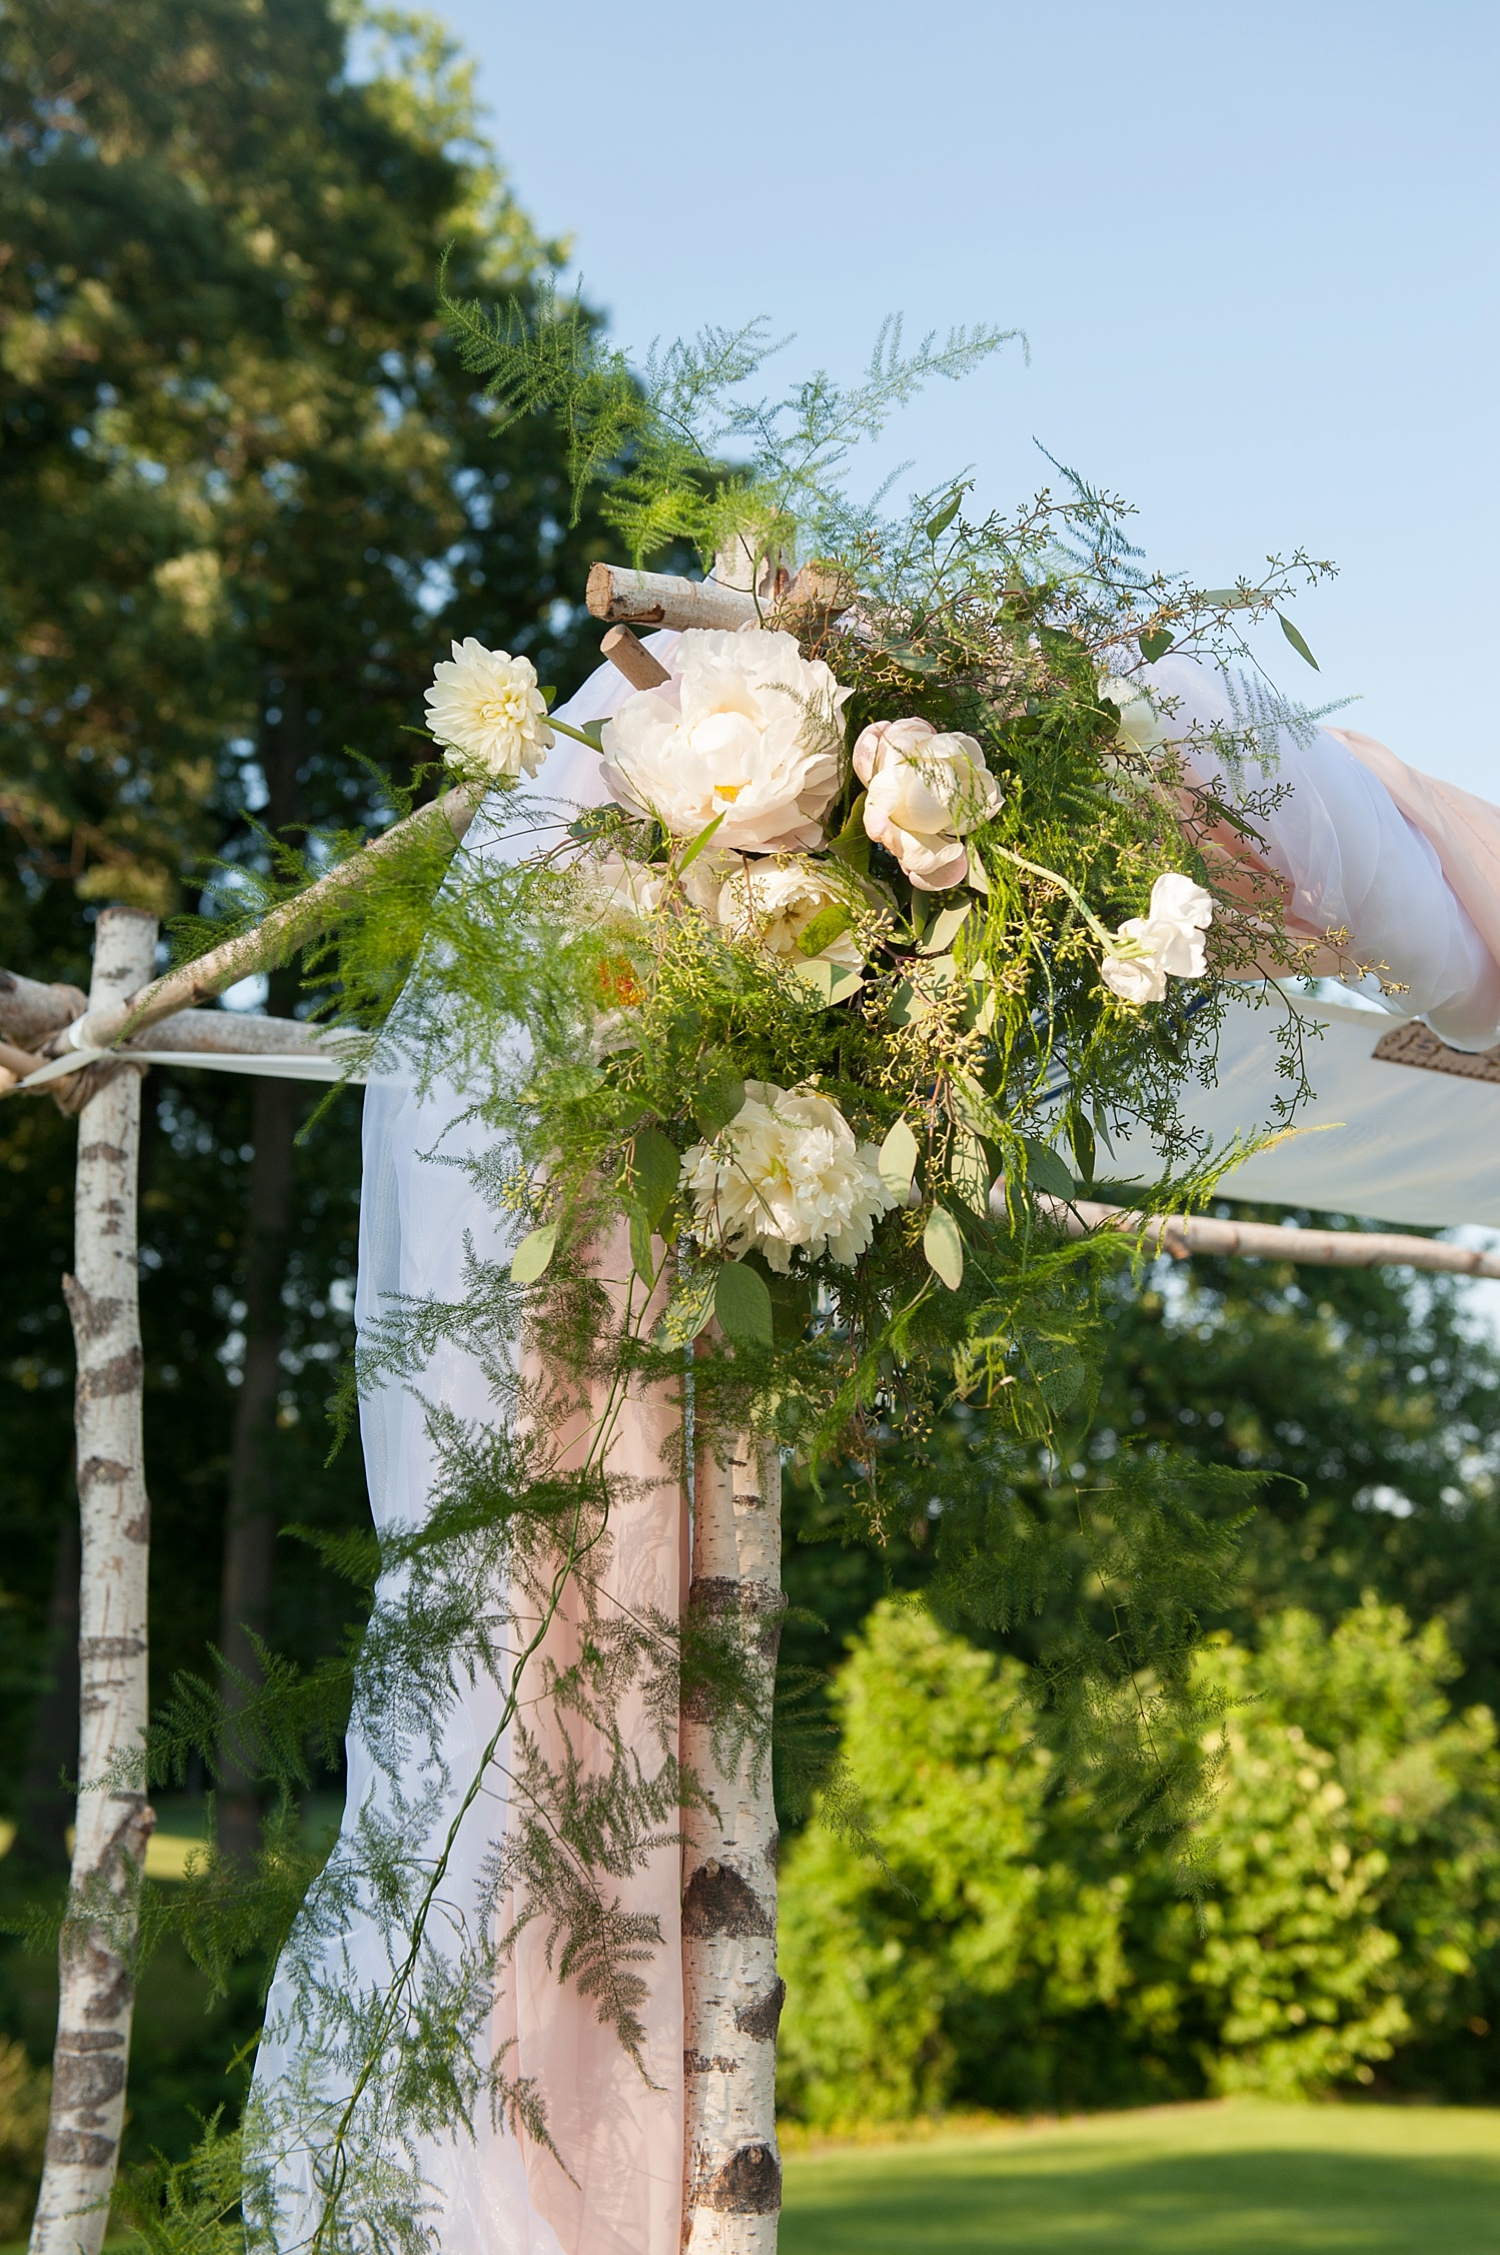 mikkelpaige-full_aperture_floral-pearl_river_hilton_wedding_0021.jpg